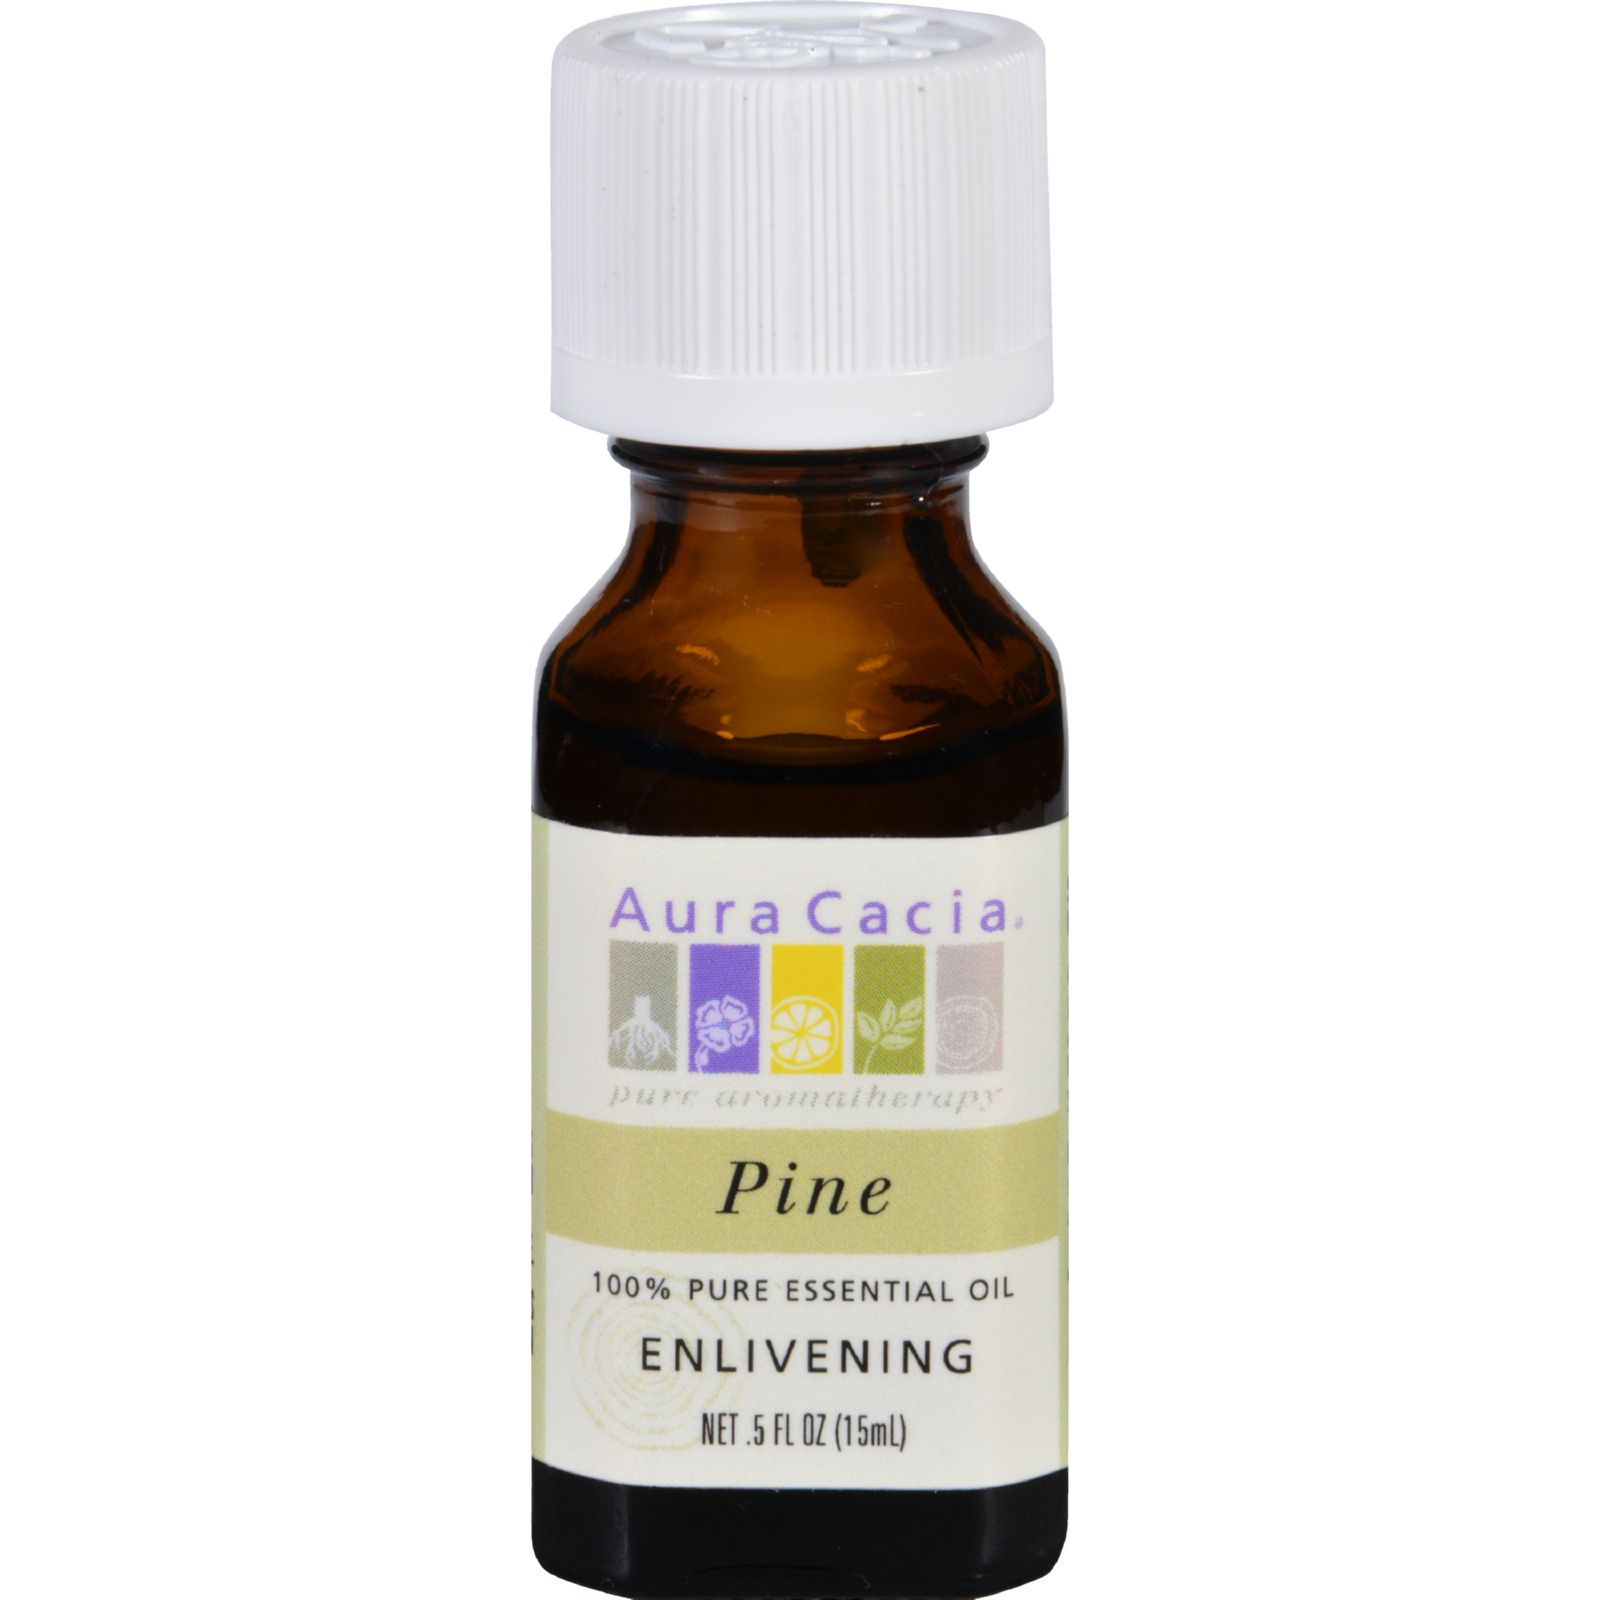 Aura Cacia Essential Oil Pine .5 oz Oil